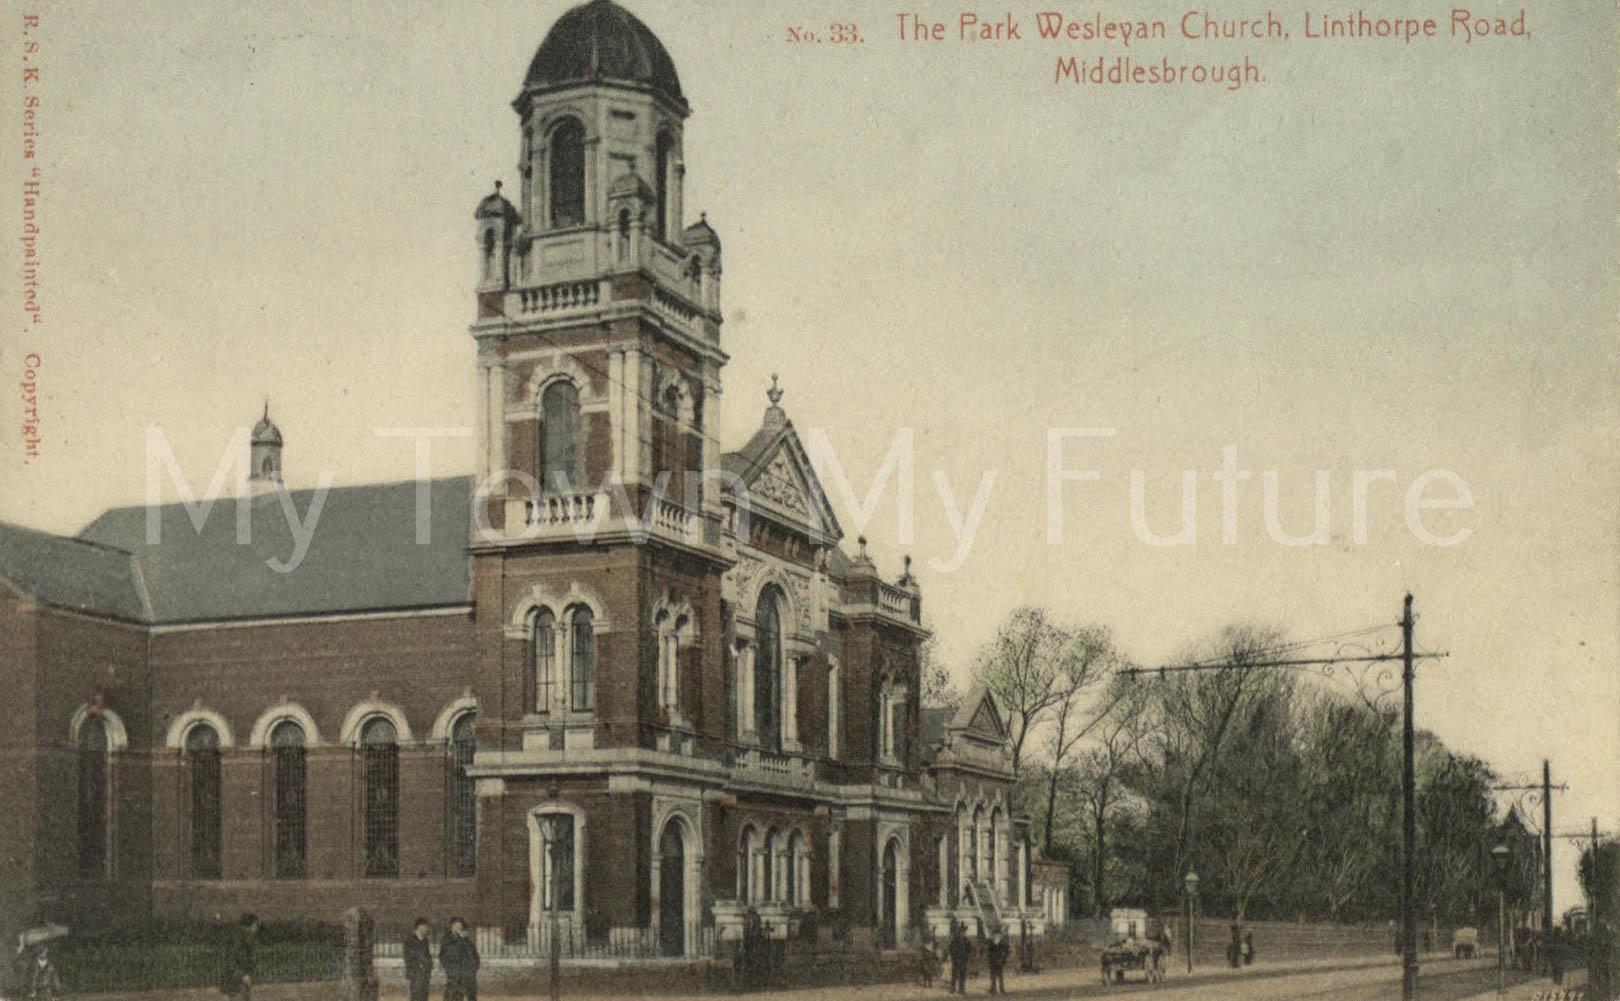 Park Wesleyan Church,Linthorpe Road